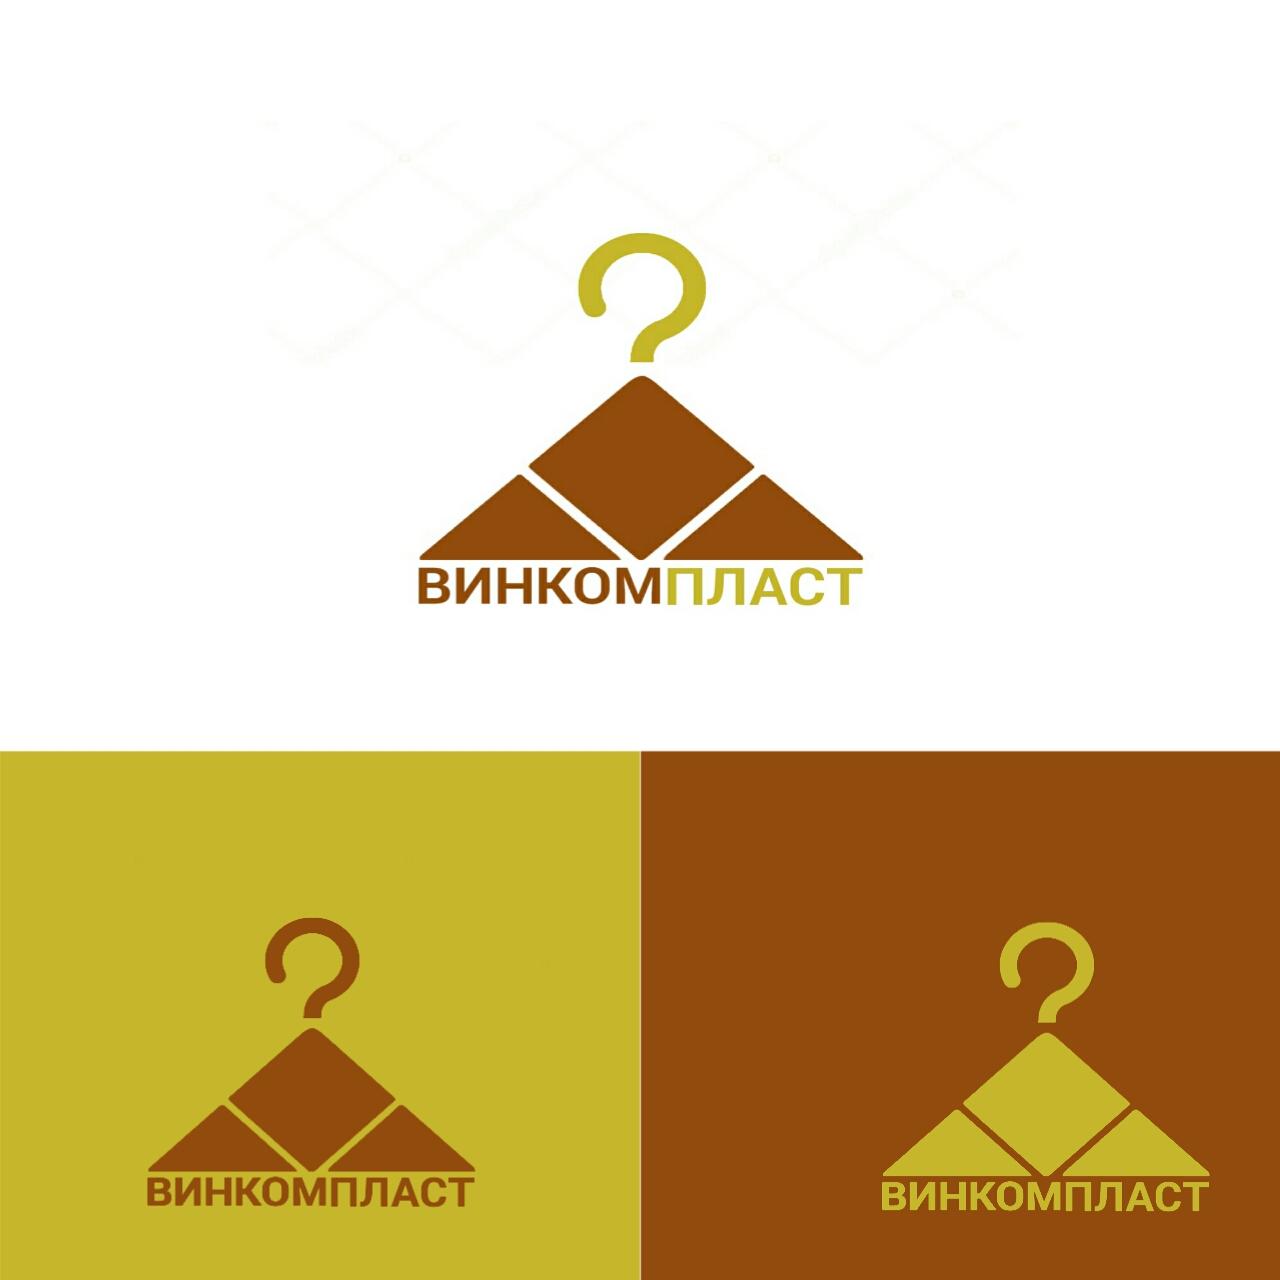 Логотип, фавикон и визитка для компании Винком Пласт  фото f_5975c3cb20a0b049.jpg